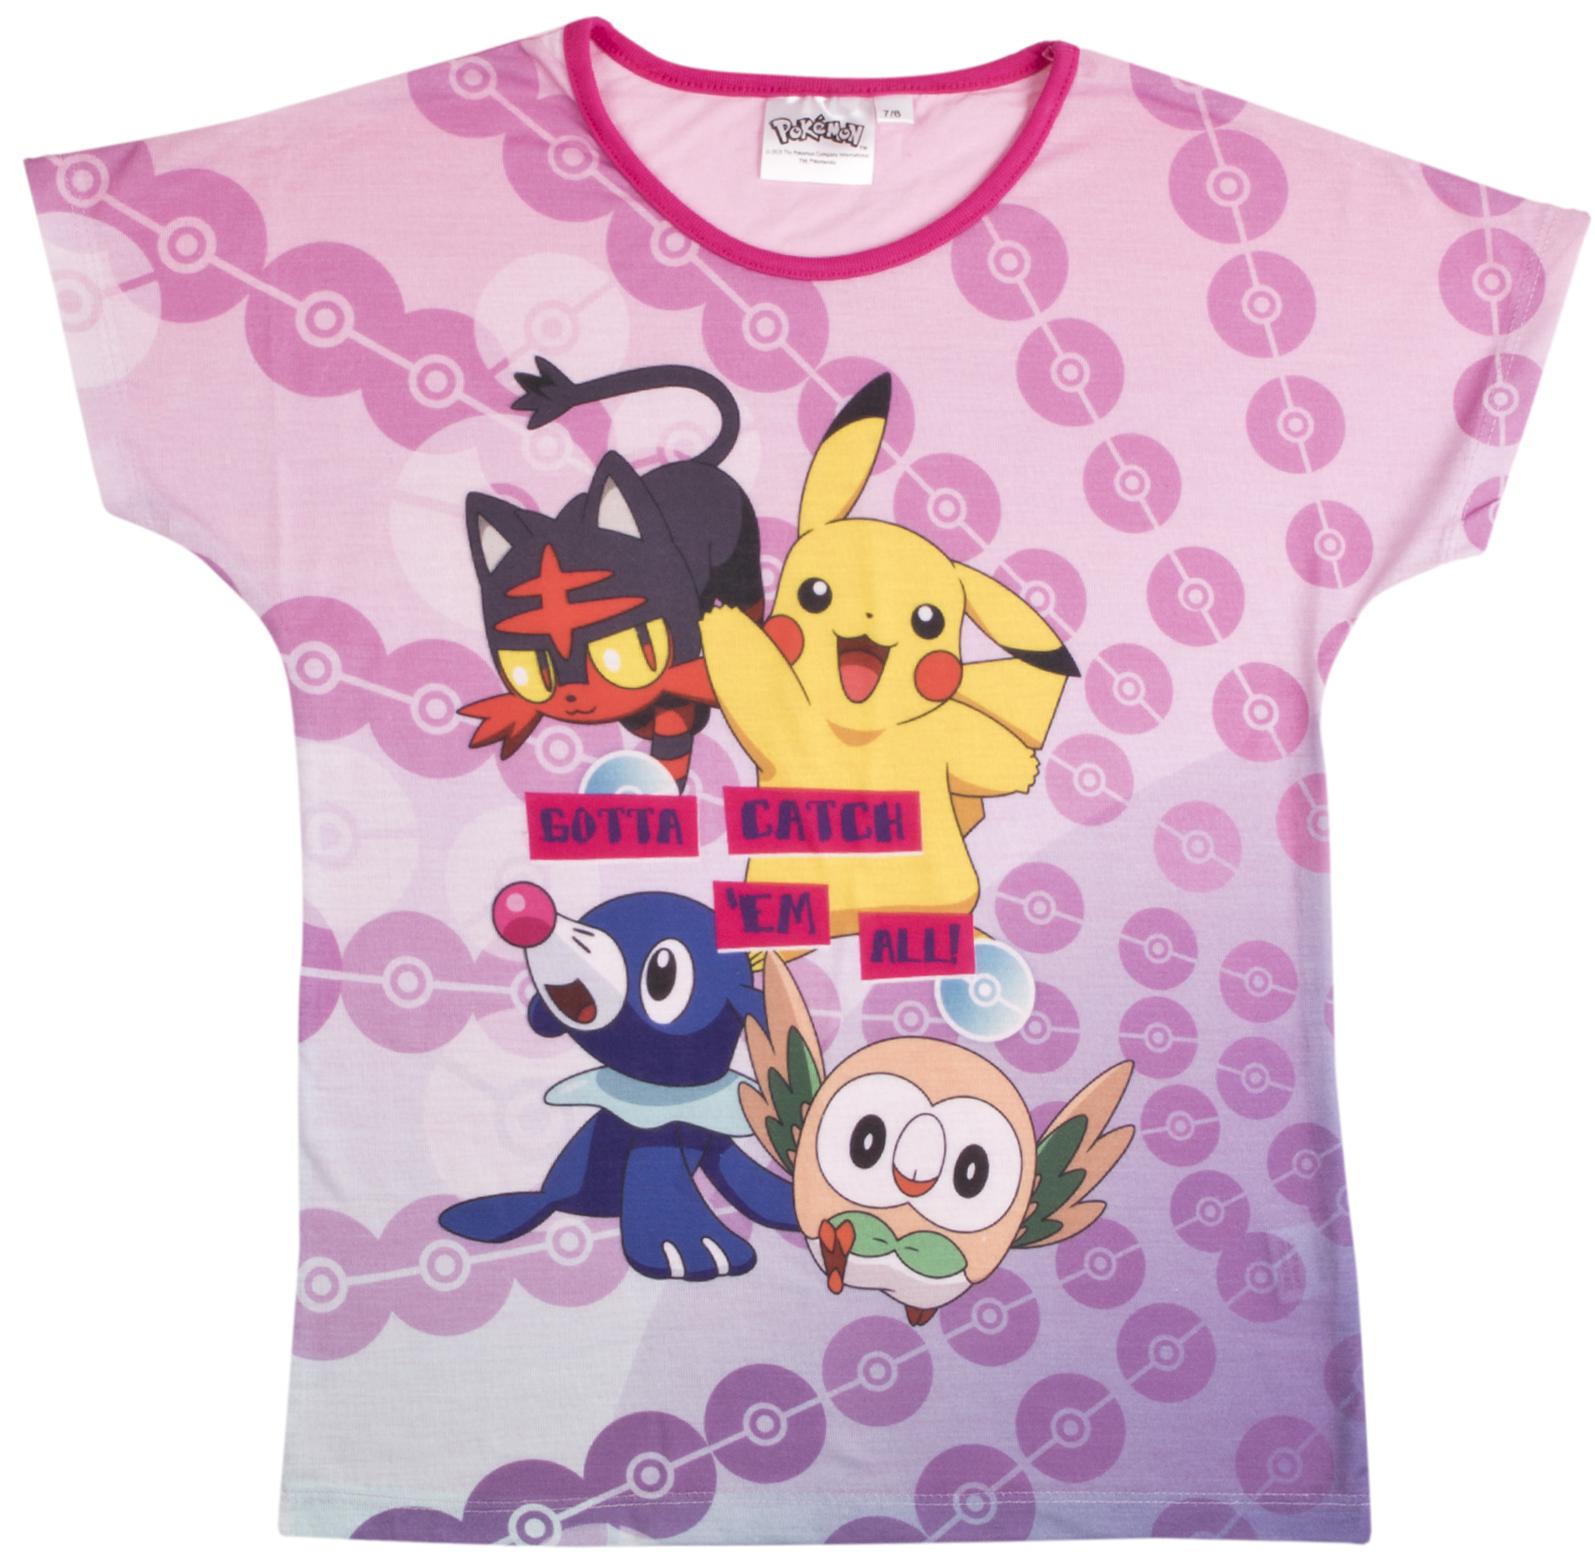 Garçons Filles Pokemon court pyjama à manches courtes Shortie Pyjama Set PIKACHU Kids Taille